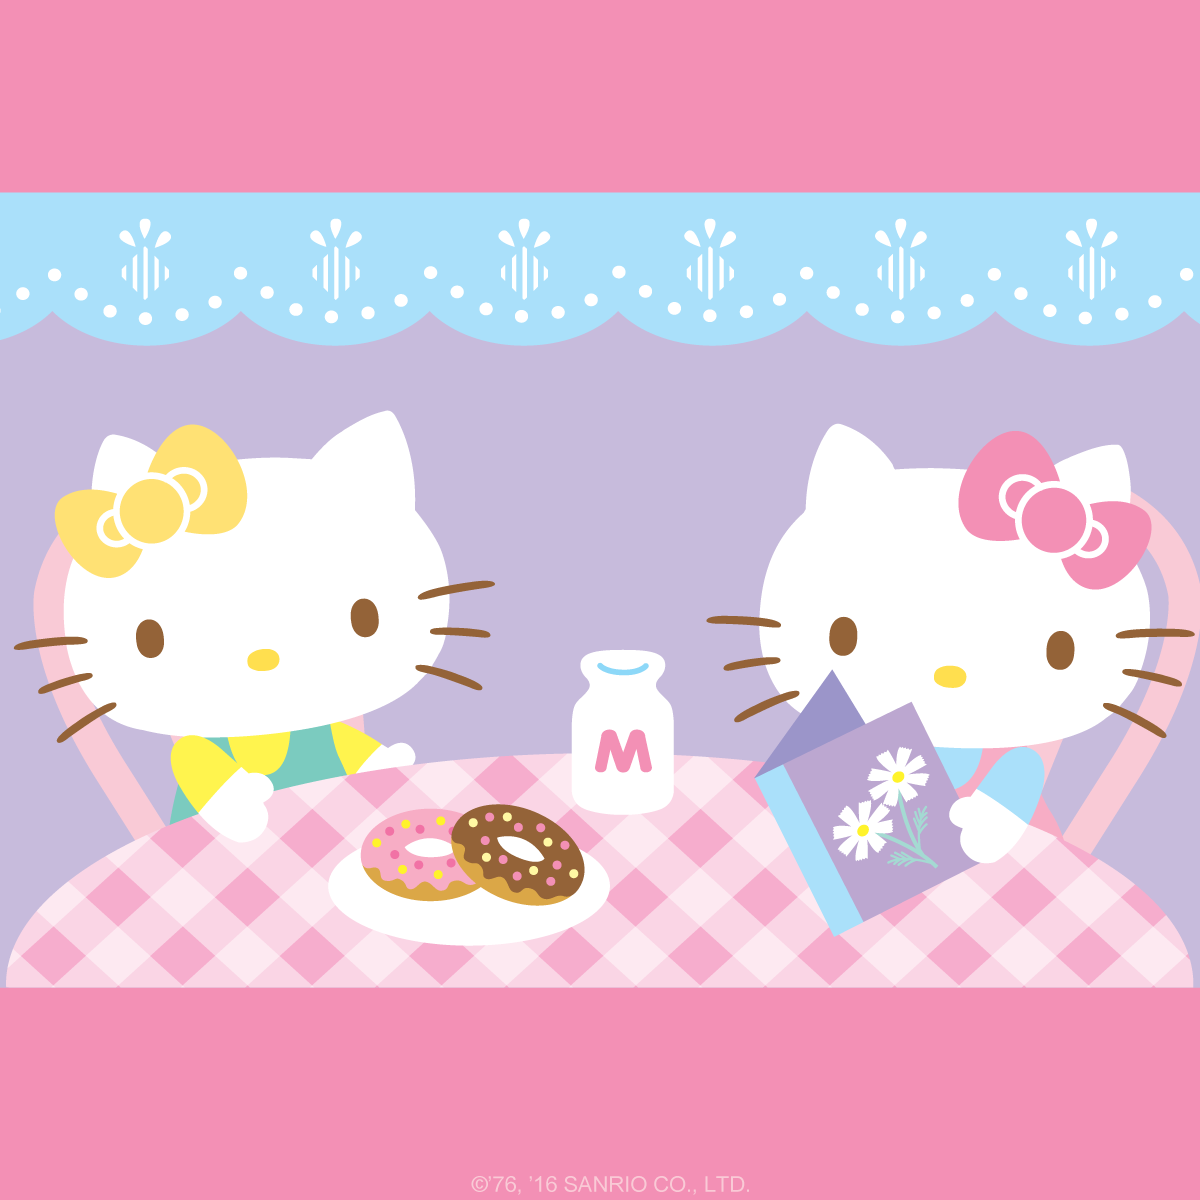 Hello Kitty Wallpaper For January